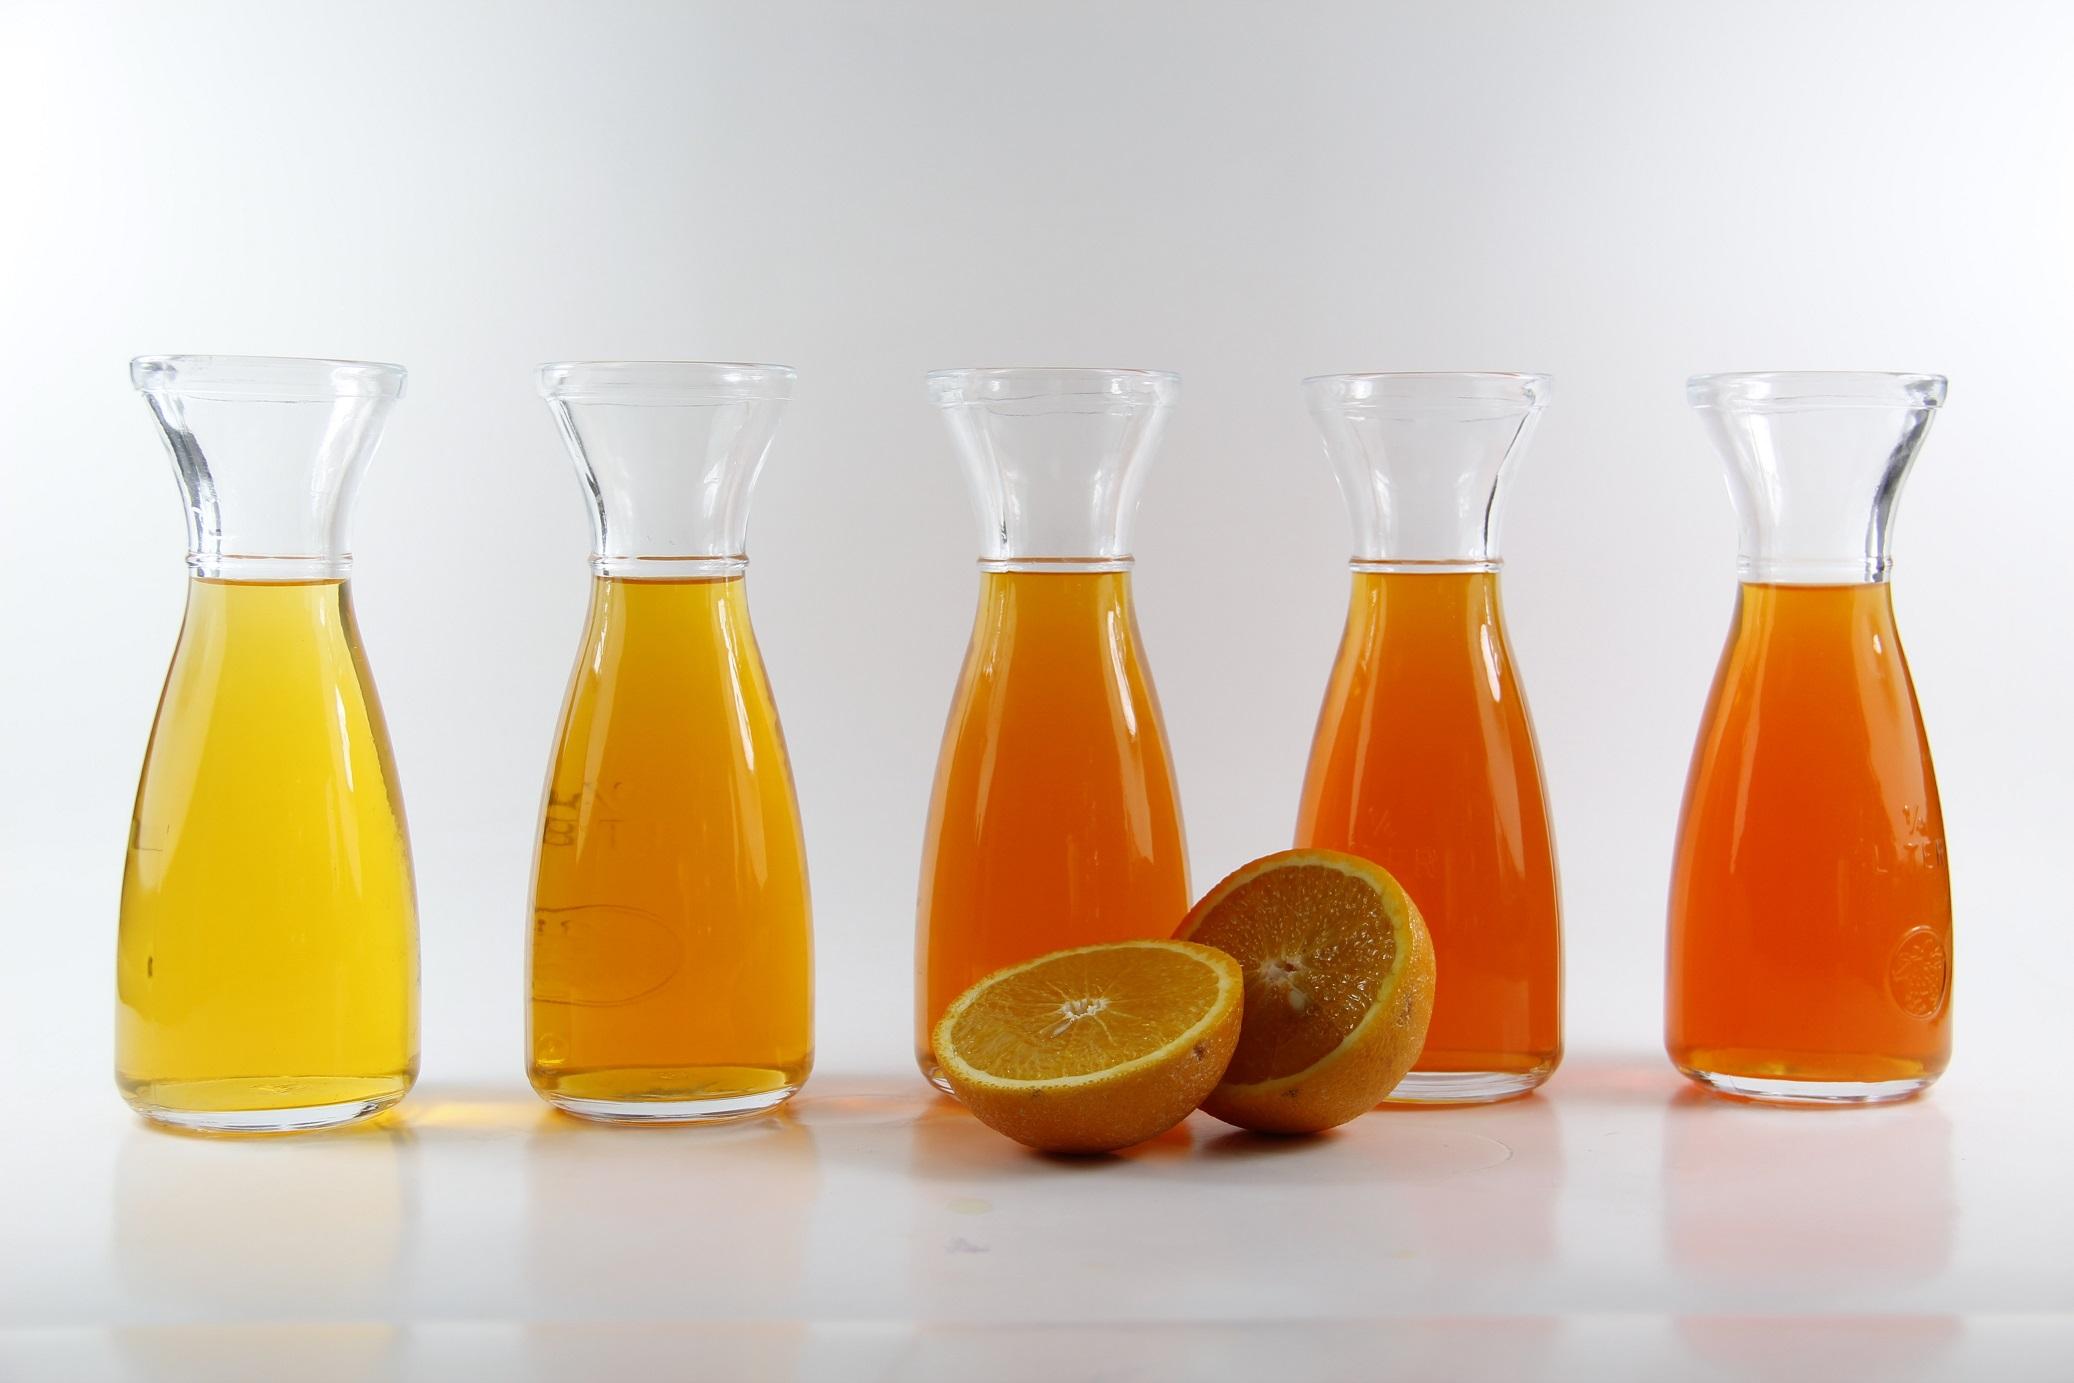 LycoRed launches new beta-carotene colorants line